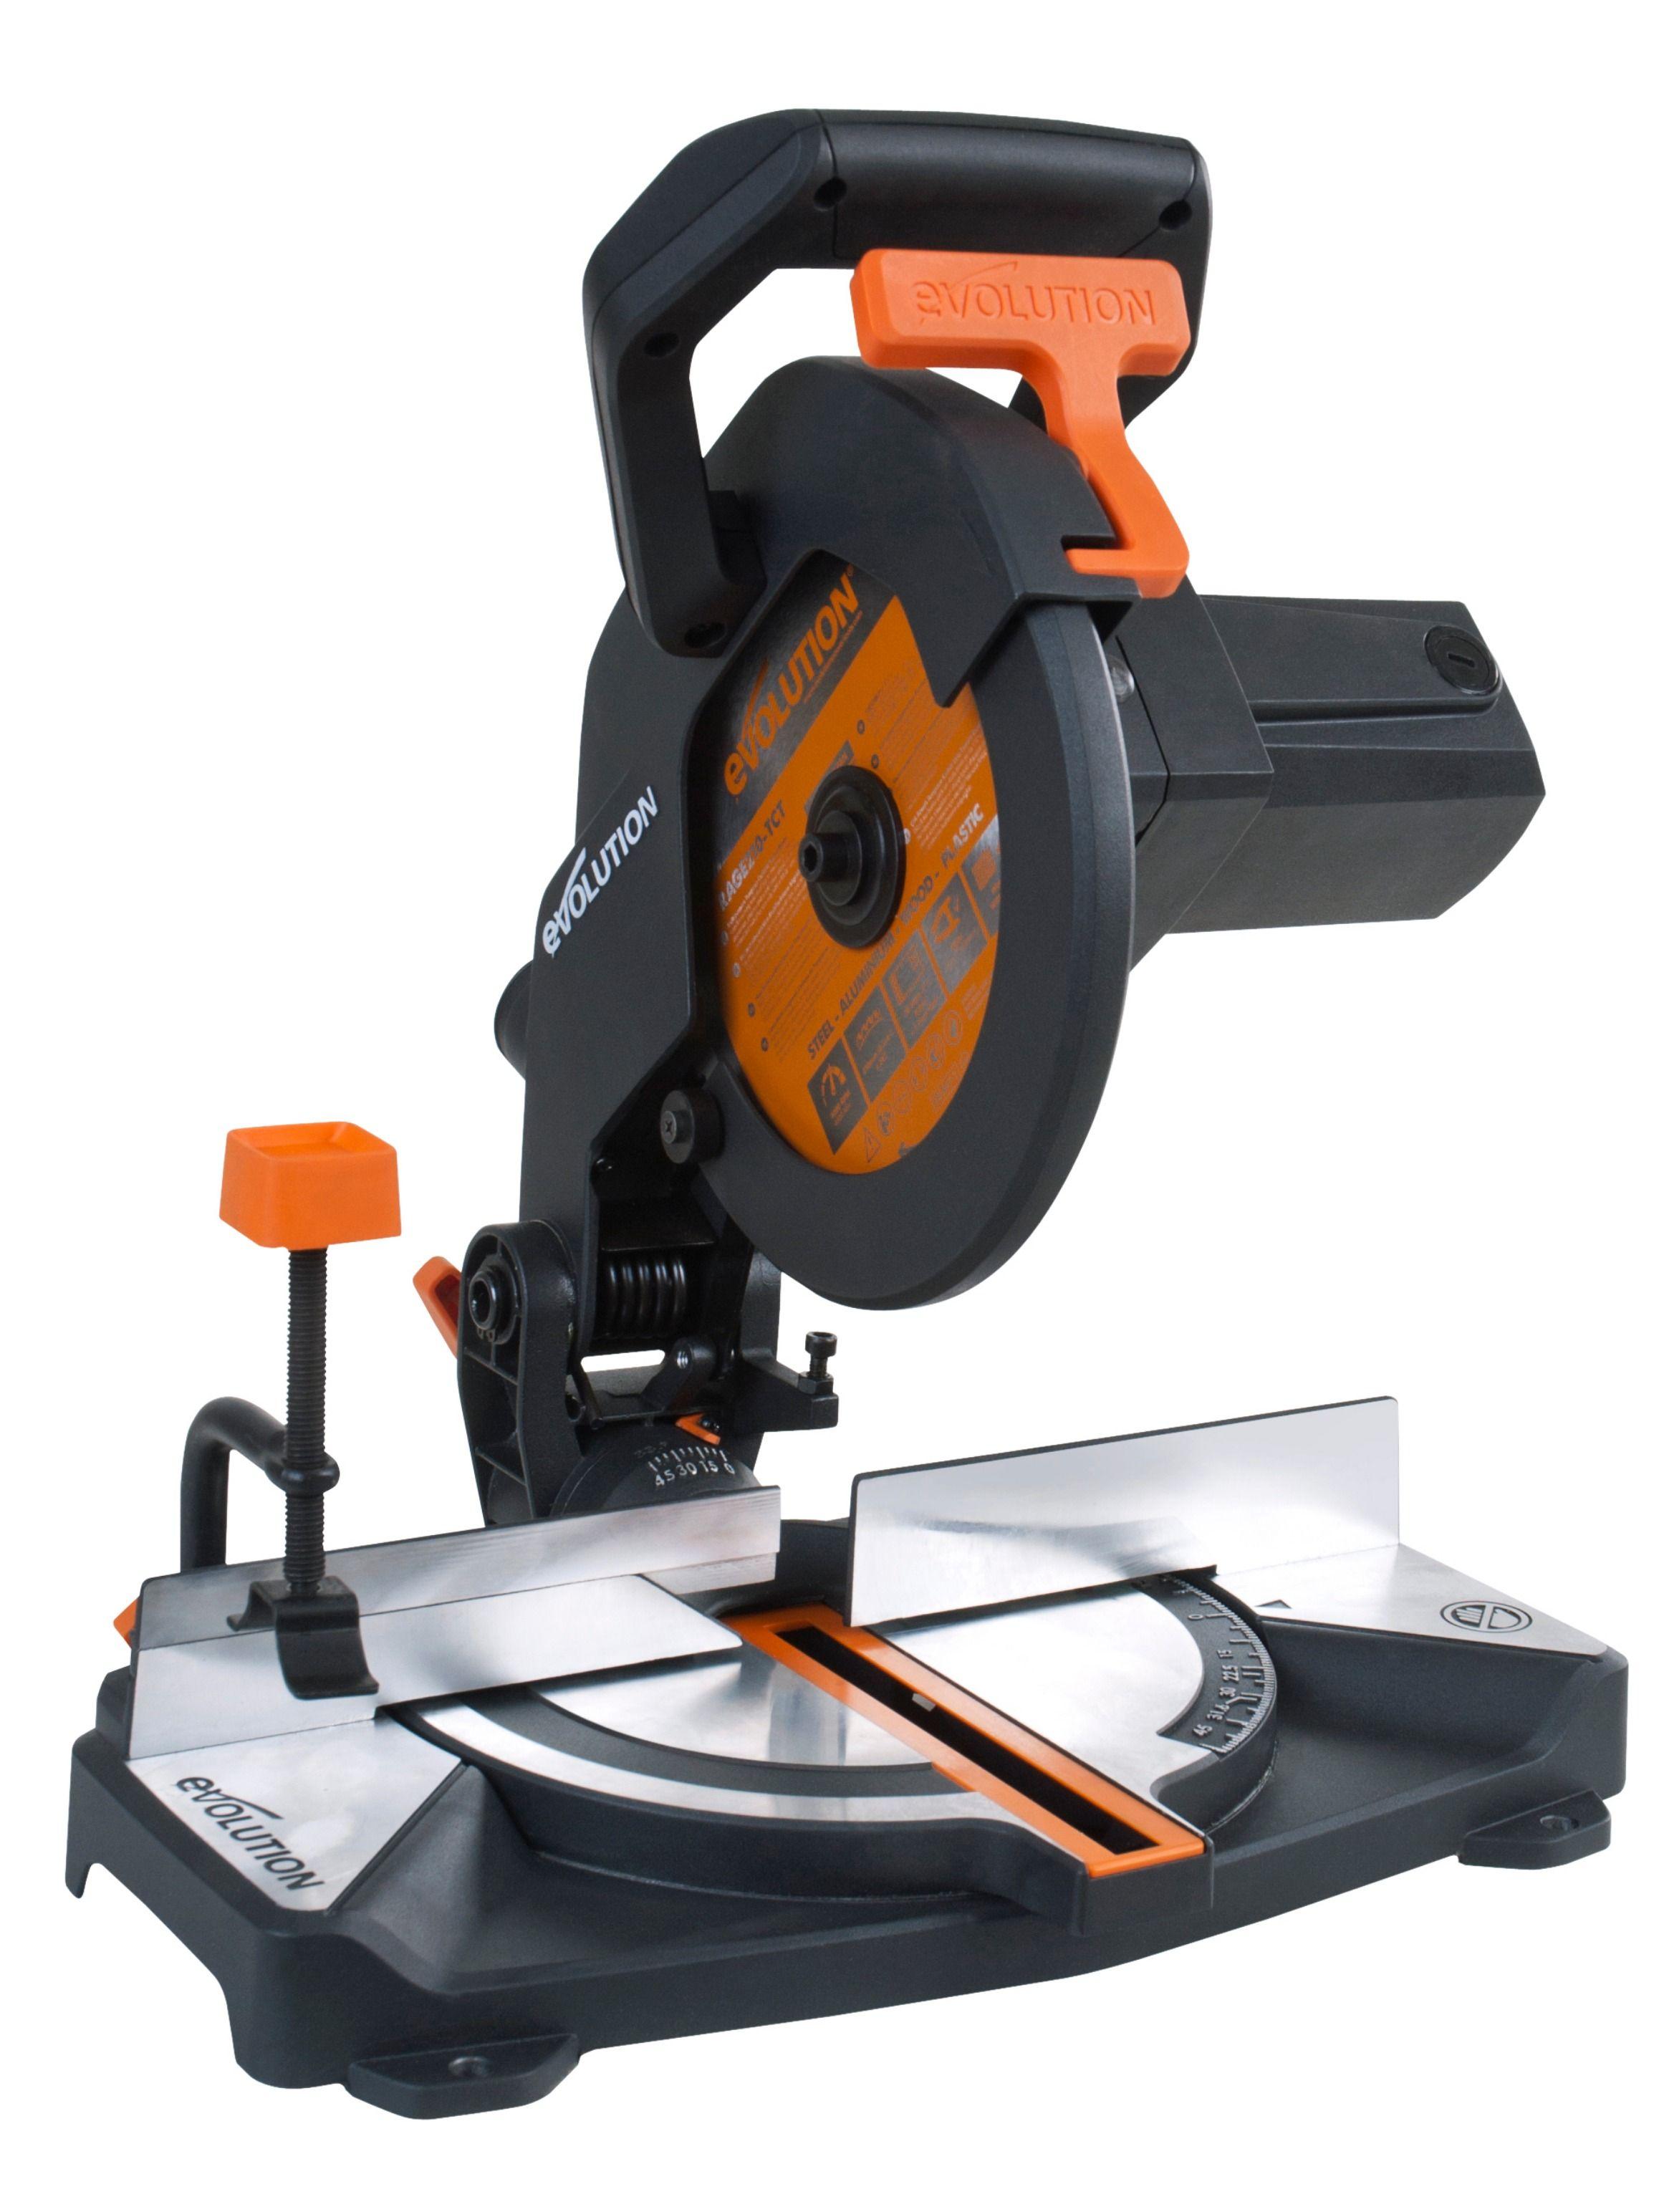 Evolution power tools r210cms professional compound mitre